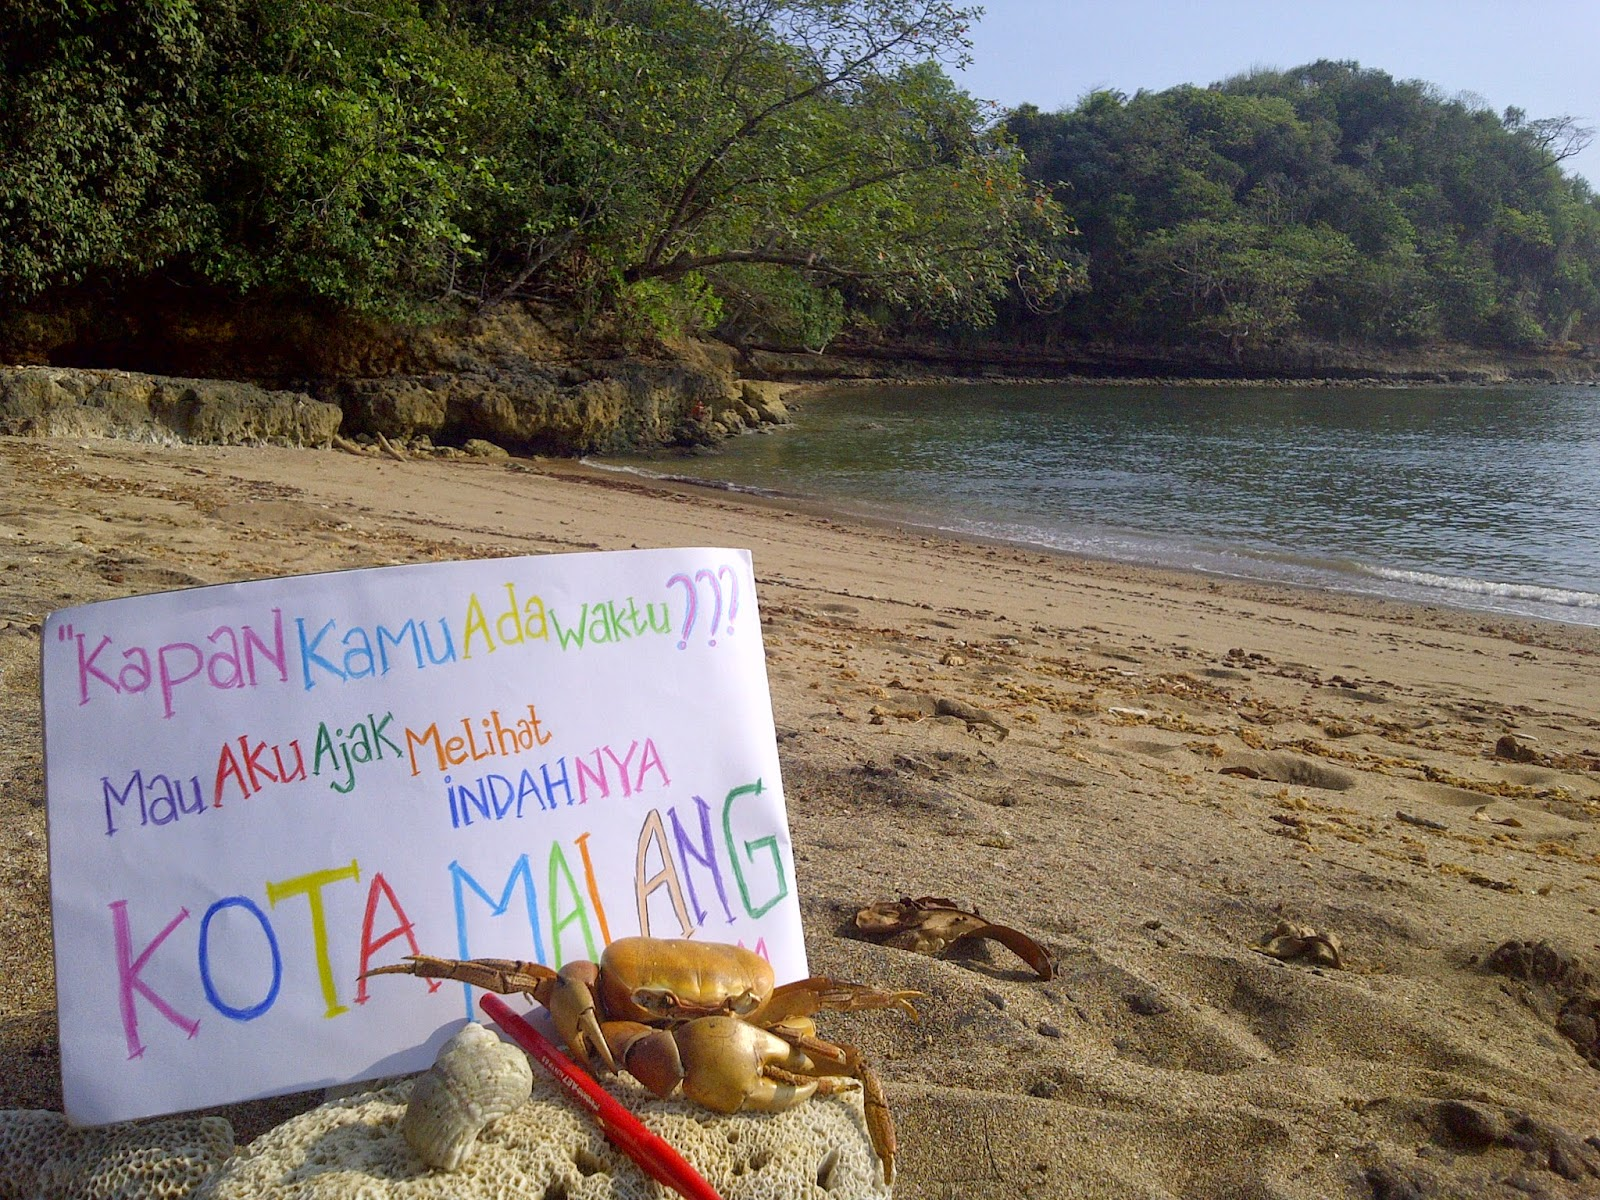 Ferdy Waterfall Pantai Bantol Modangan Kab Malang